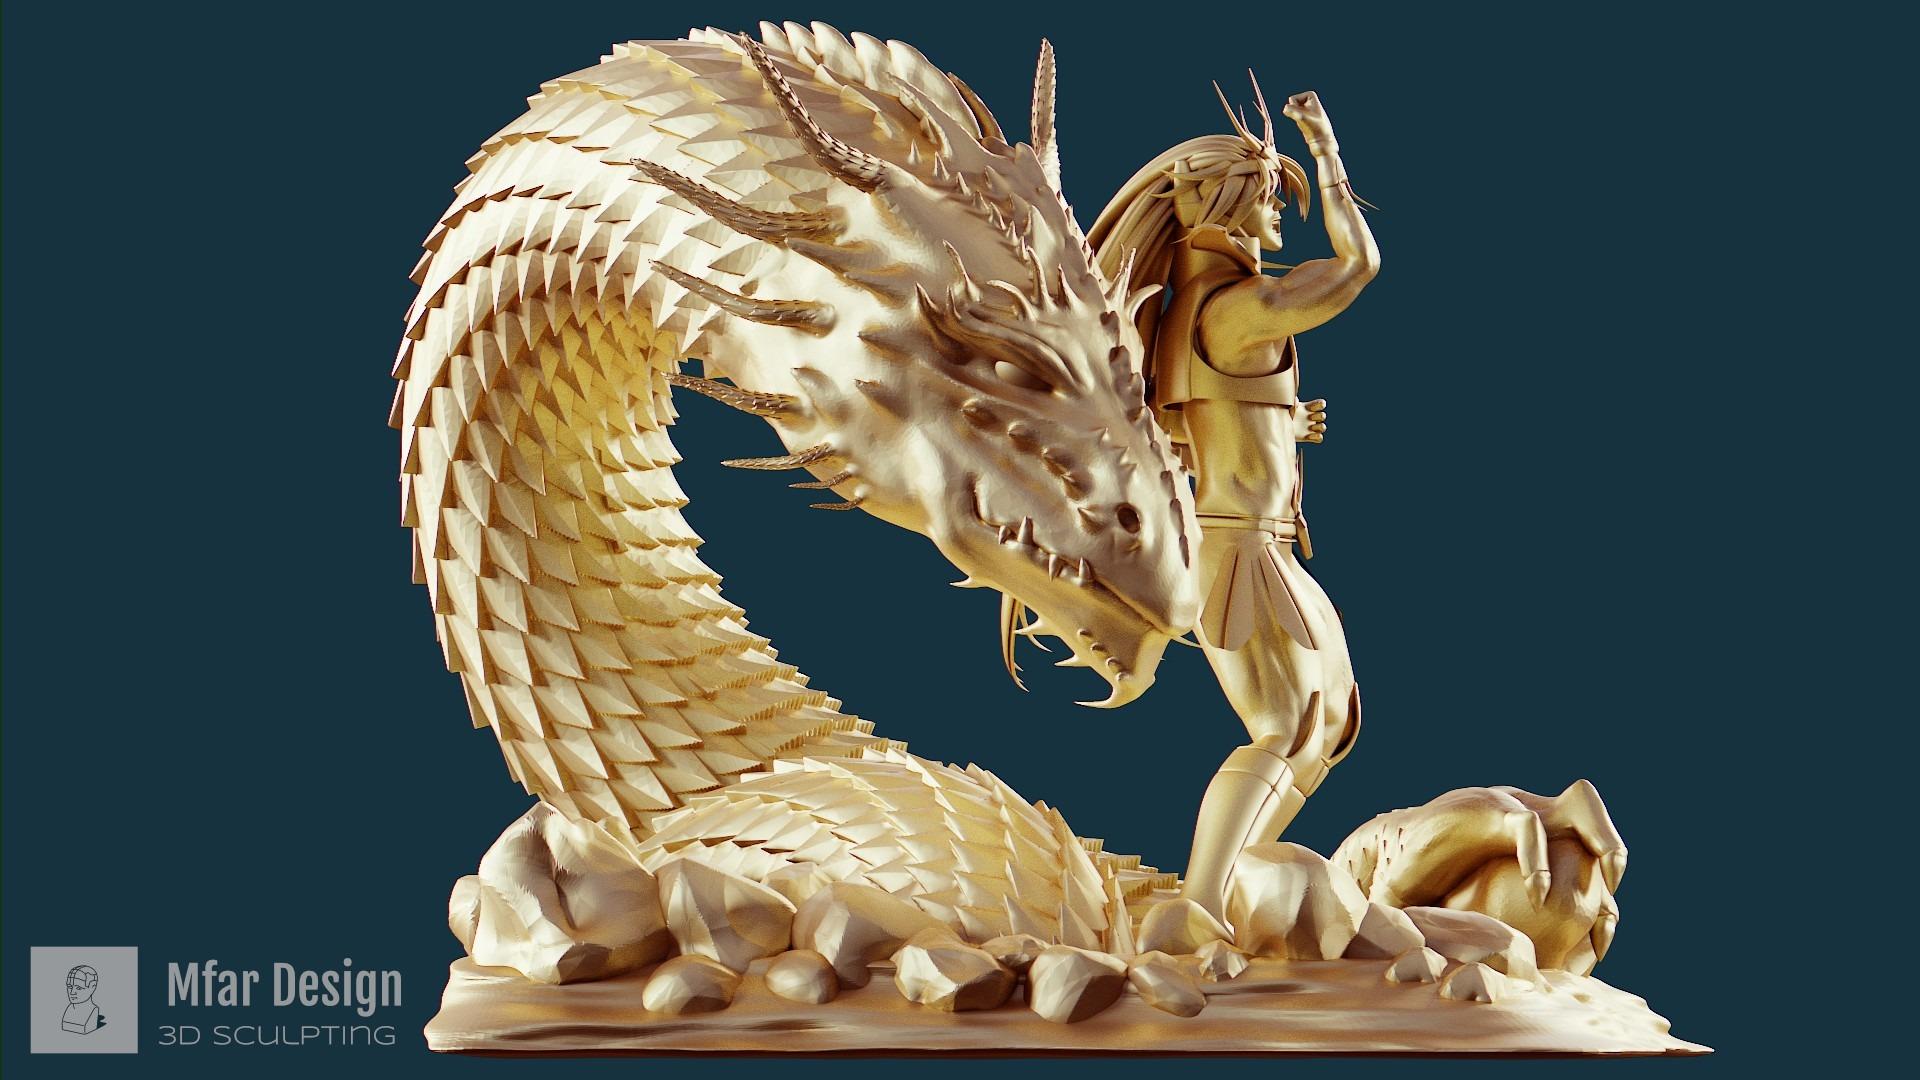 dragon_shiryu_mfar_left_logo